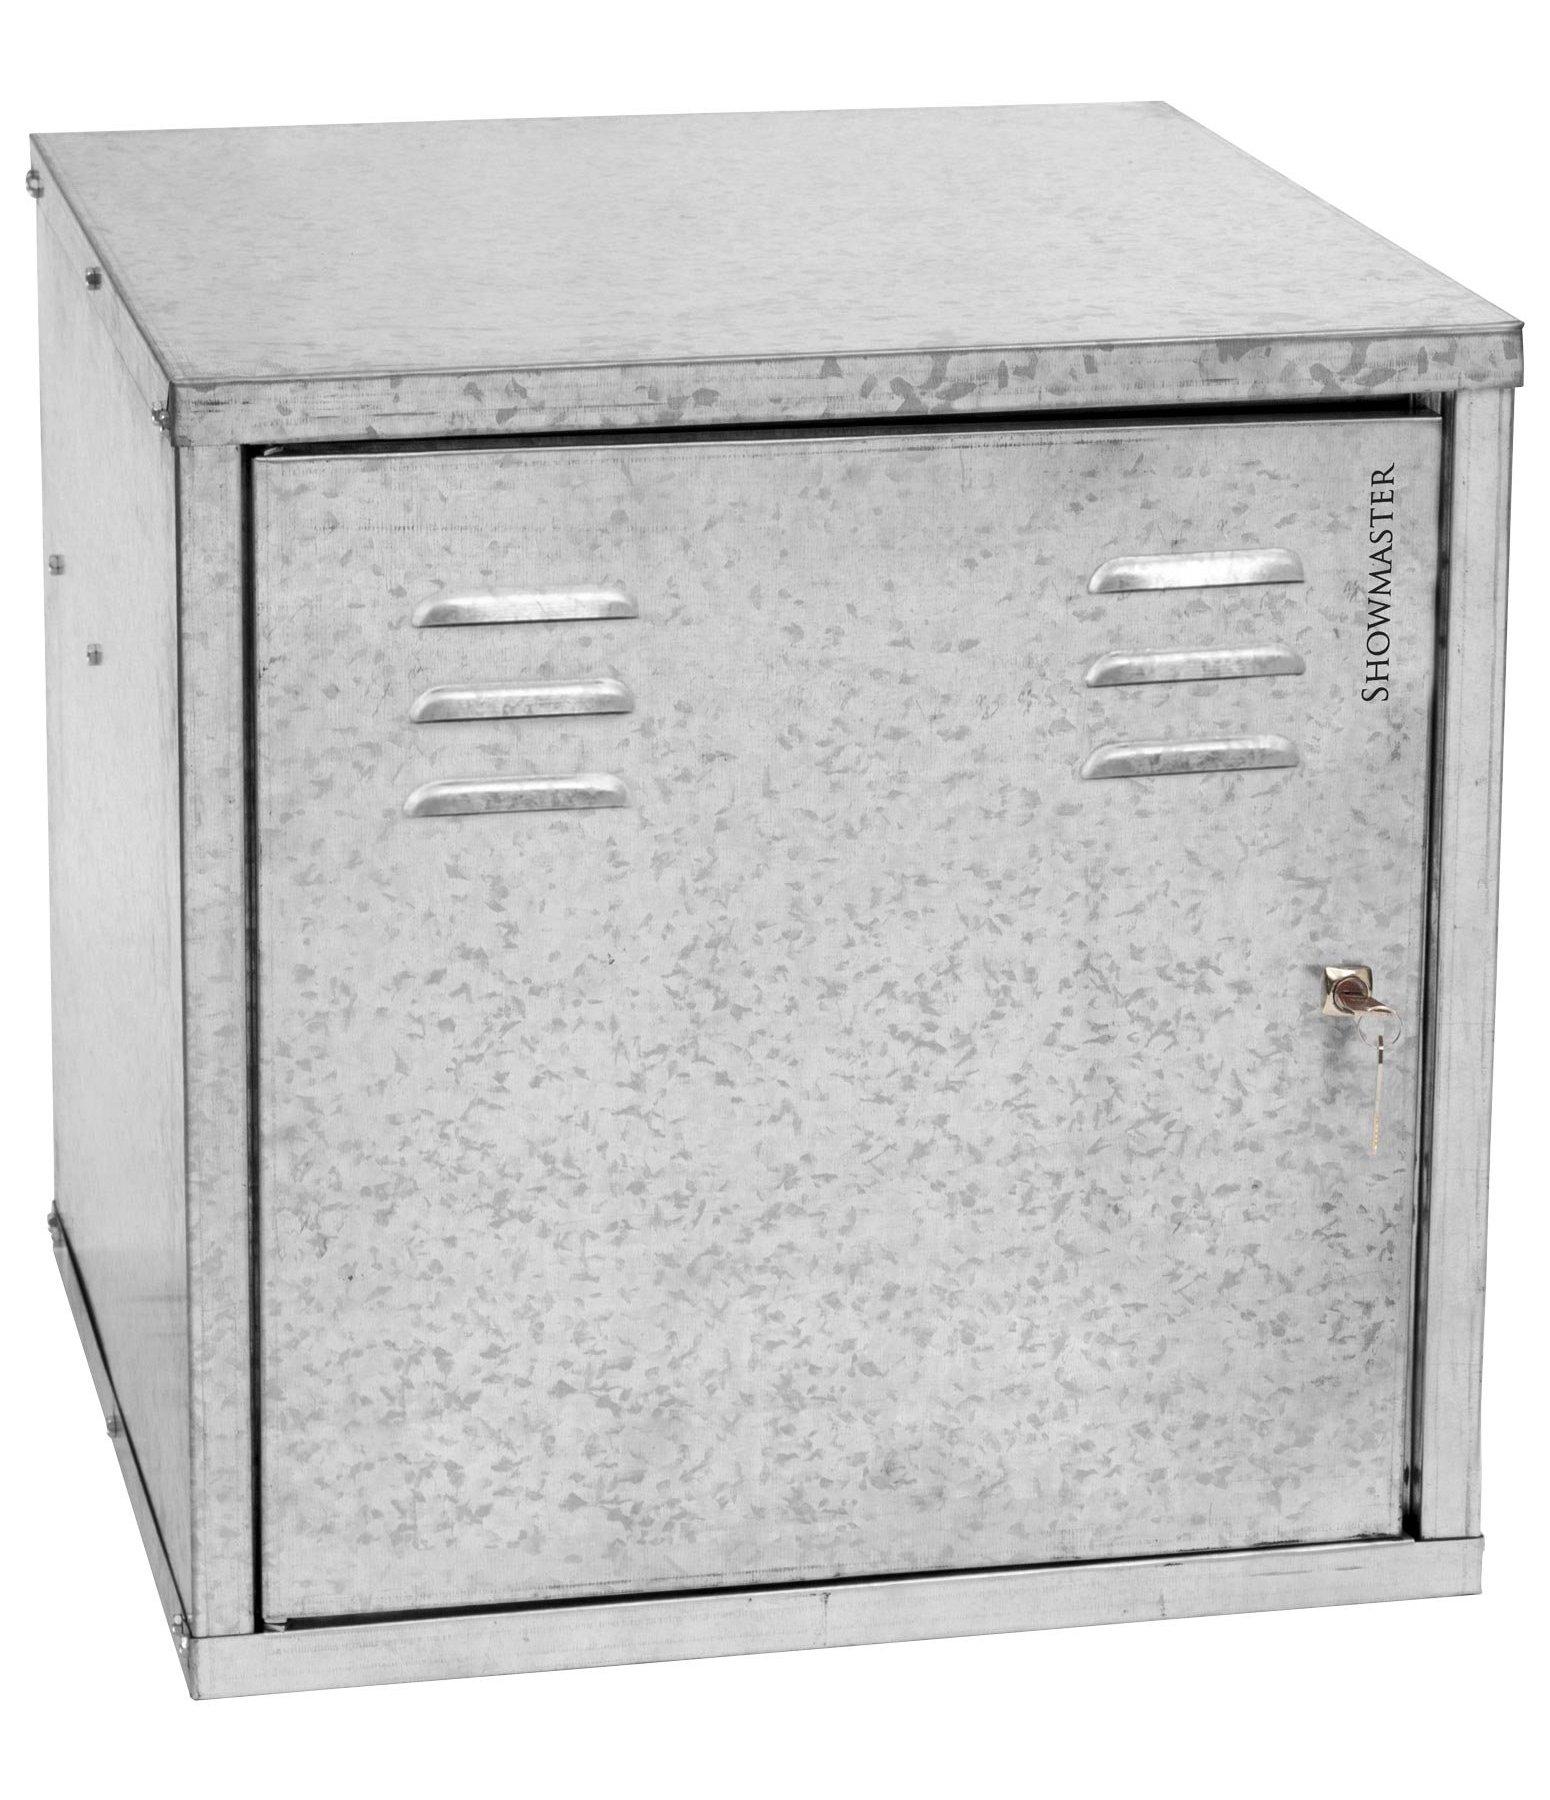 r hausse d 39 armoire rangements supports kramer equitation. Black Bedroom Furniture Sets. Home Design Ideas